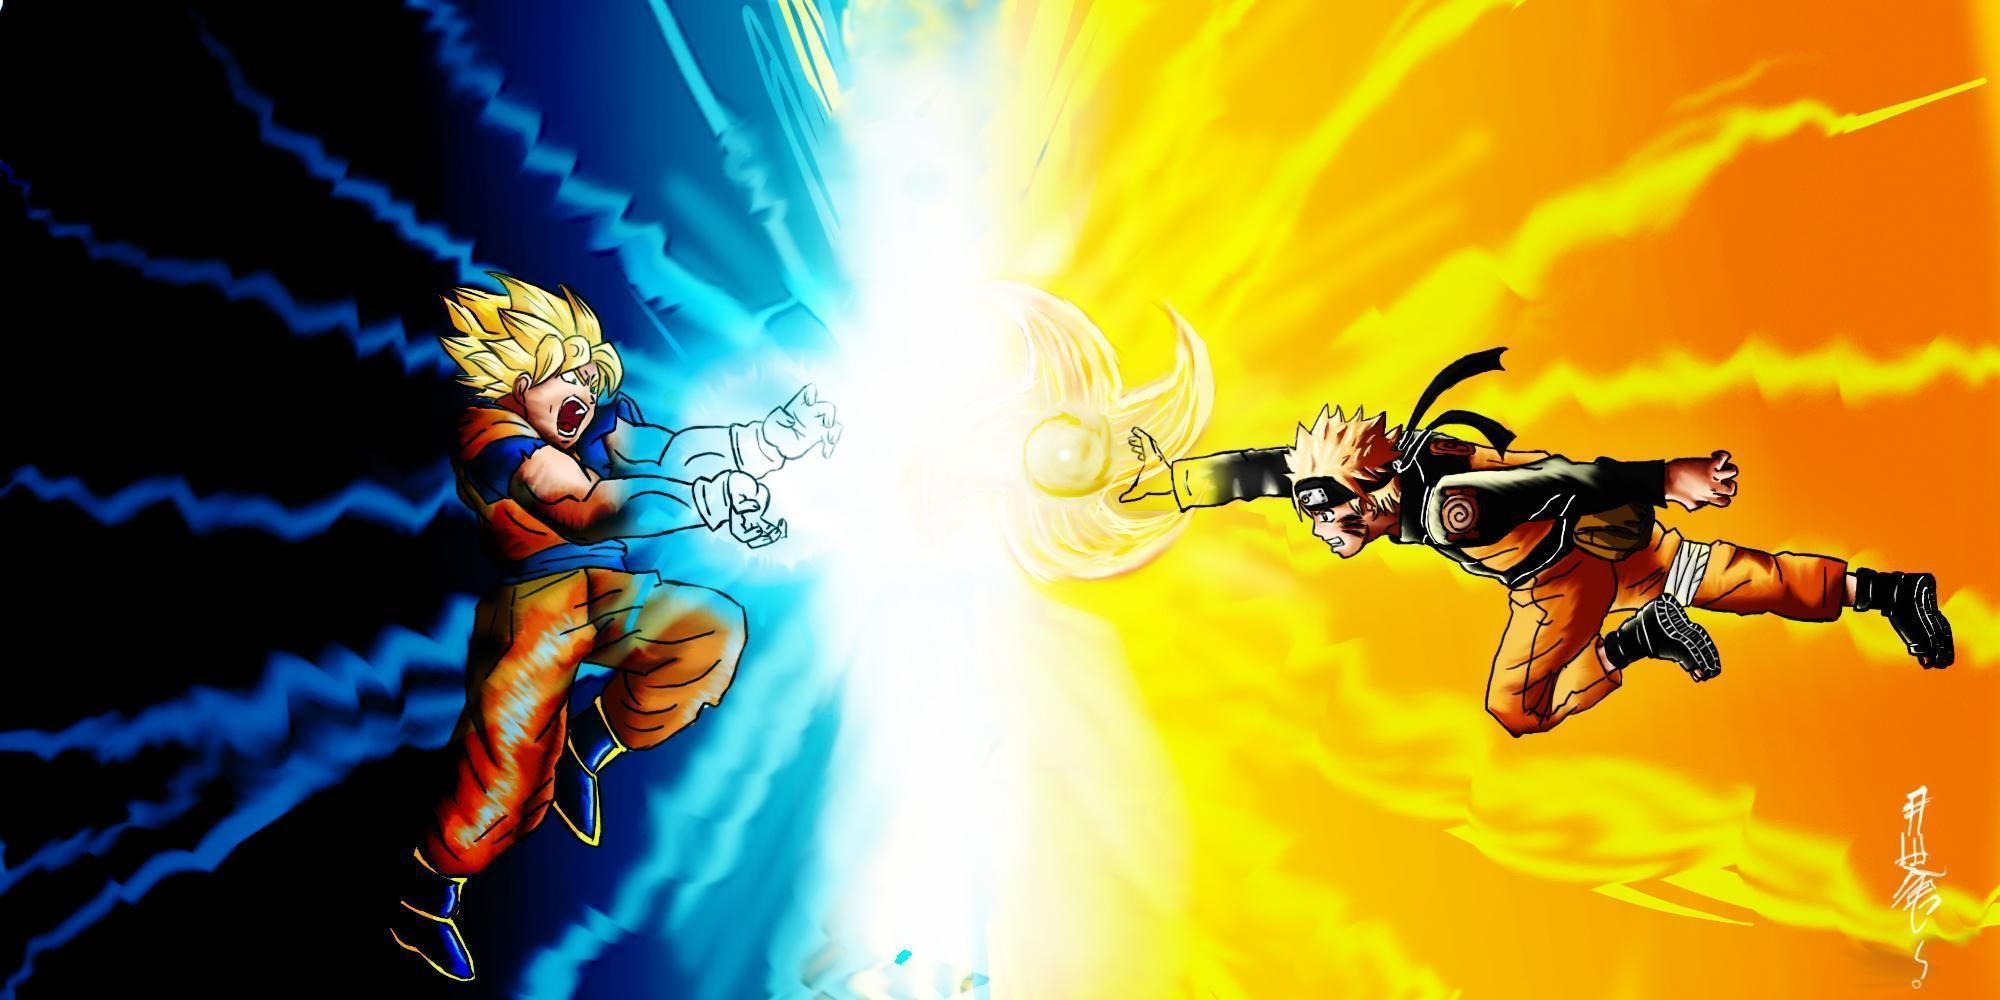 Goku Vs Naruto Wallpapers Wallpaper Cave